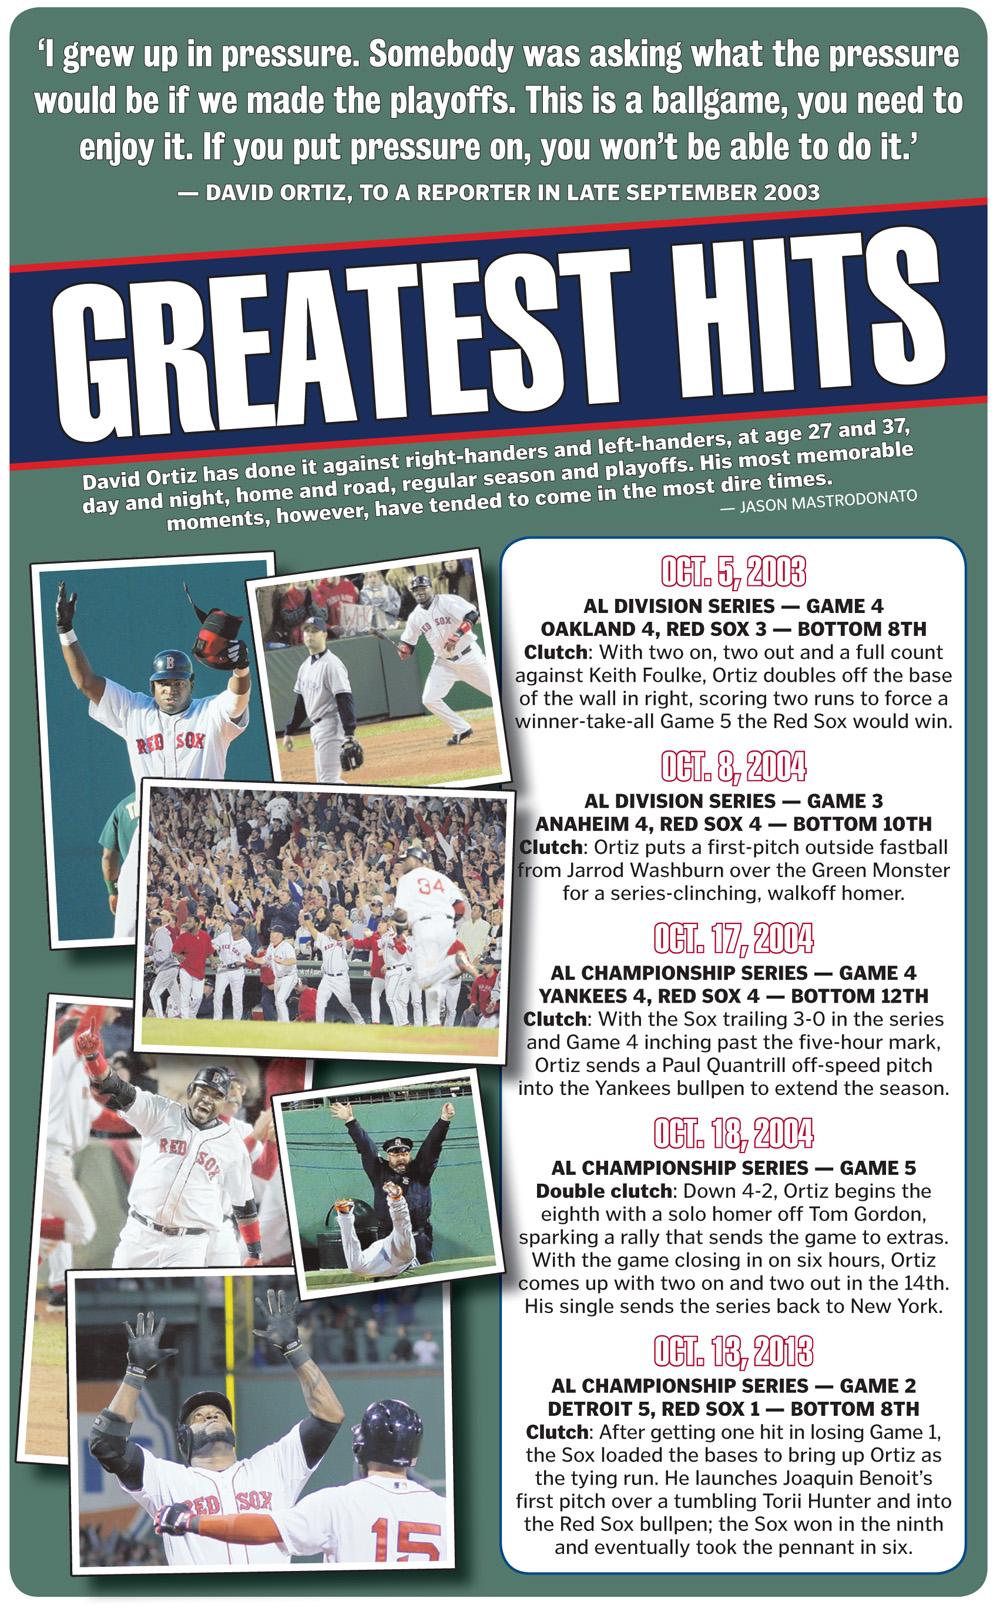 March 31, 2016 -- David Ortiz's Greatest Hits